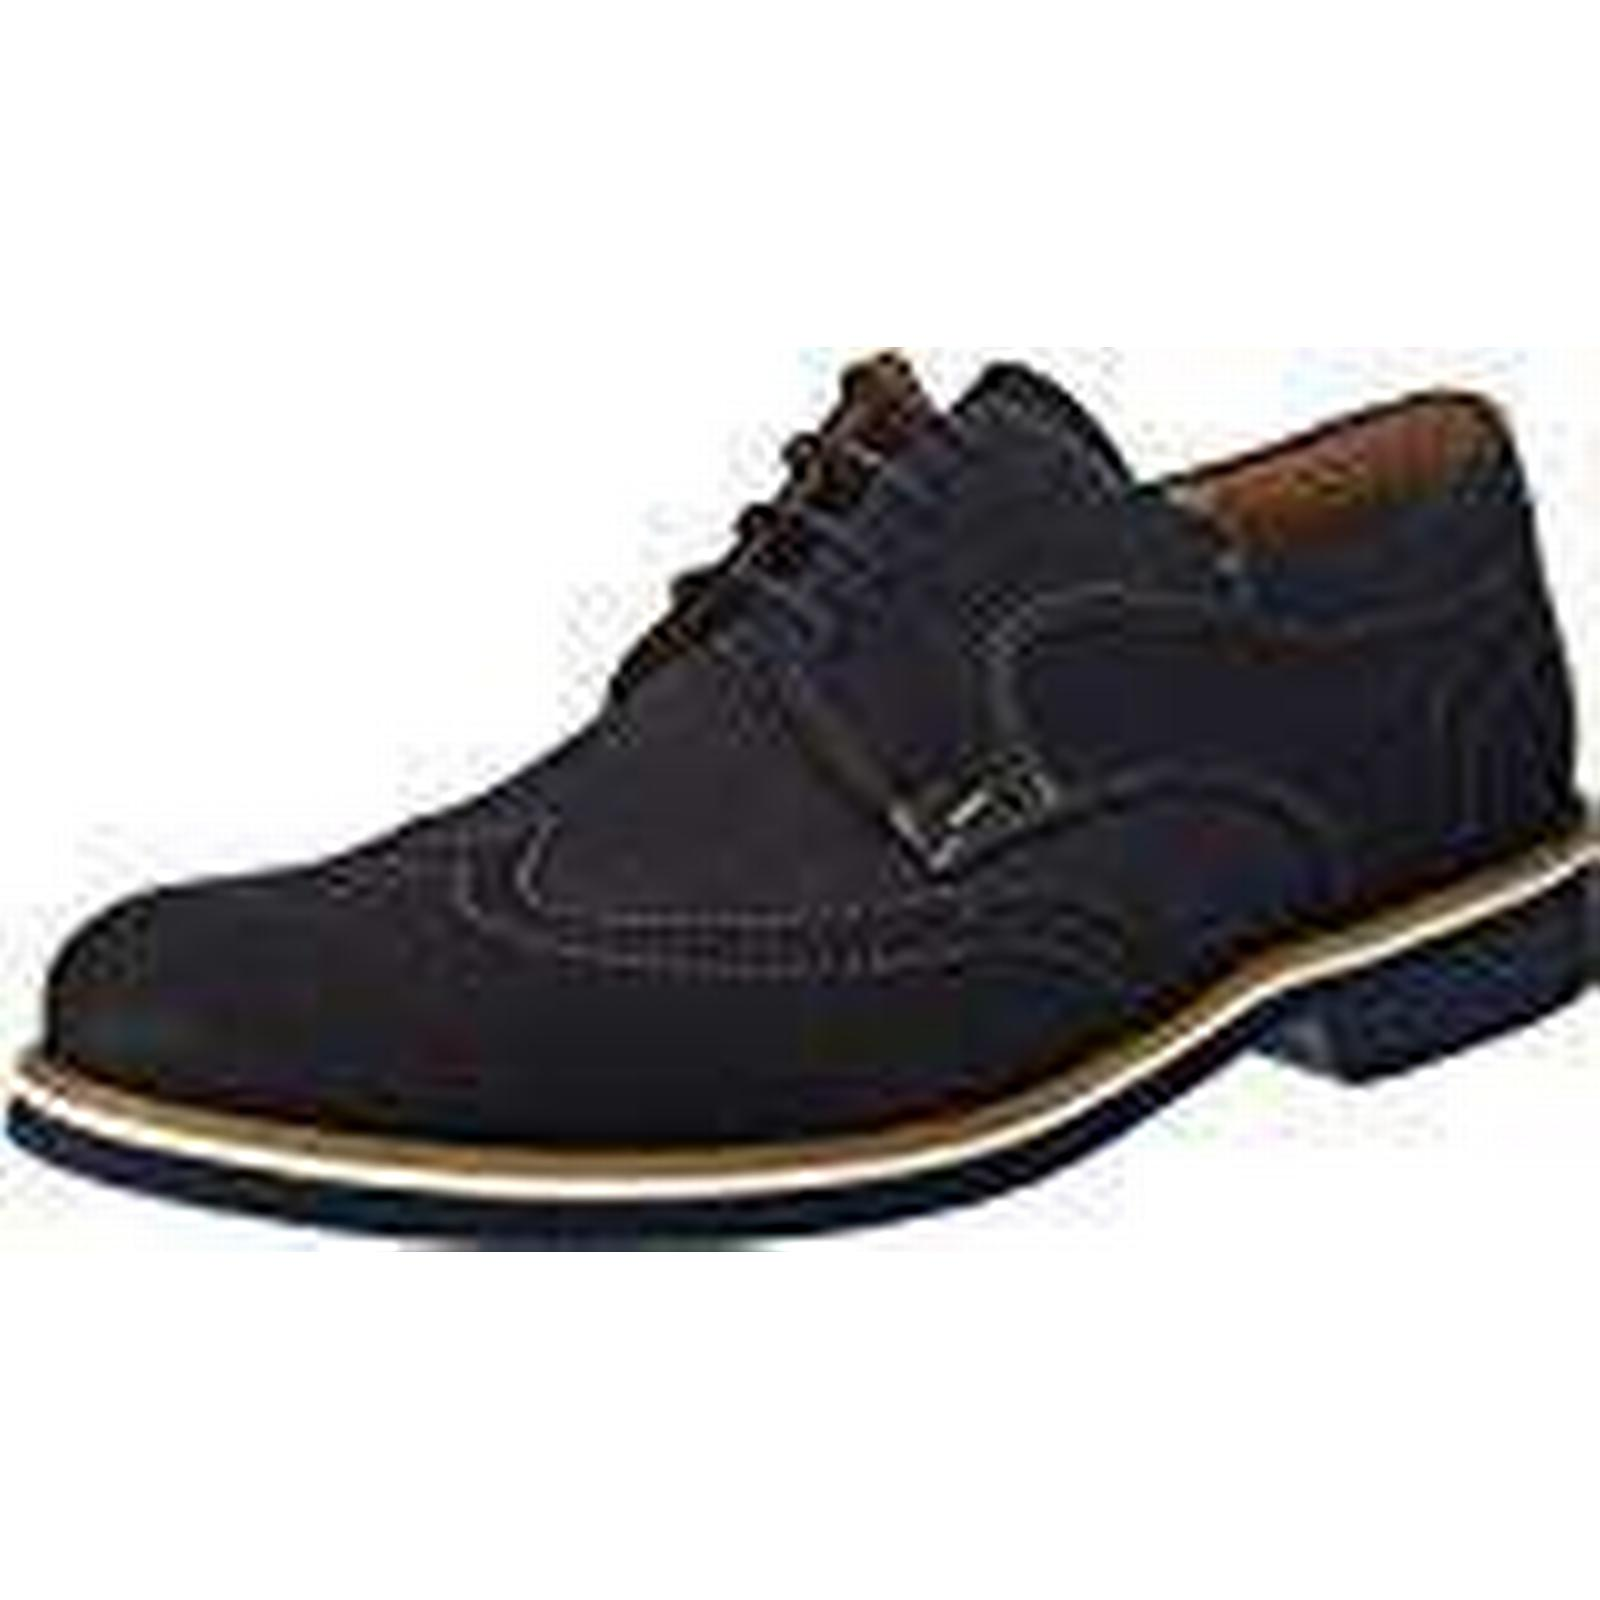 Lloyd Men's Fleet Derbys, 9.5 Blue (Ocean 9), 9.5 UK 9.5 Derbys, UK f2982b